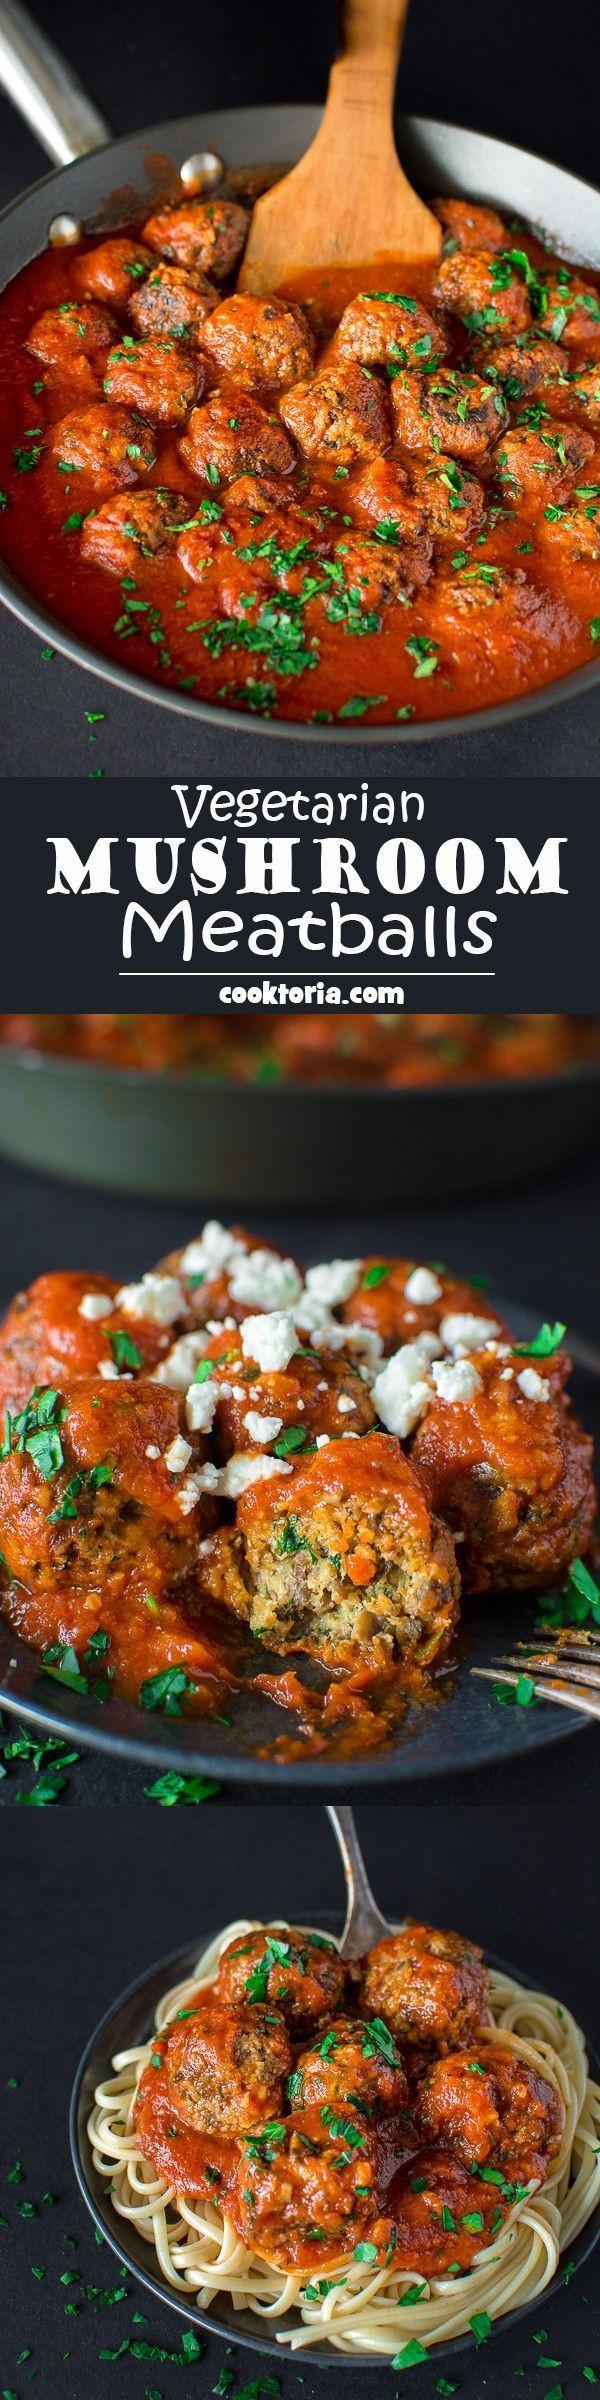 Very Healthy Dinners  Ve arian mushroom meatballs Recipe